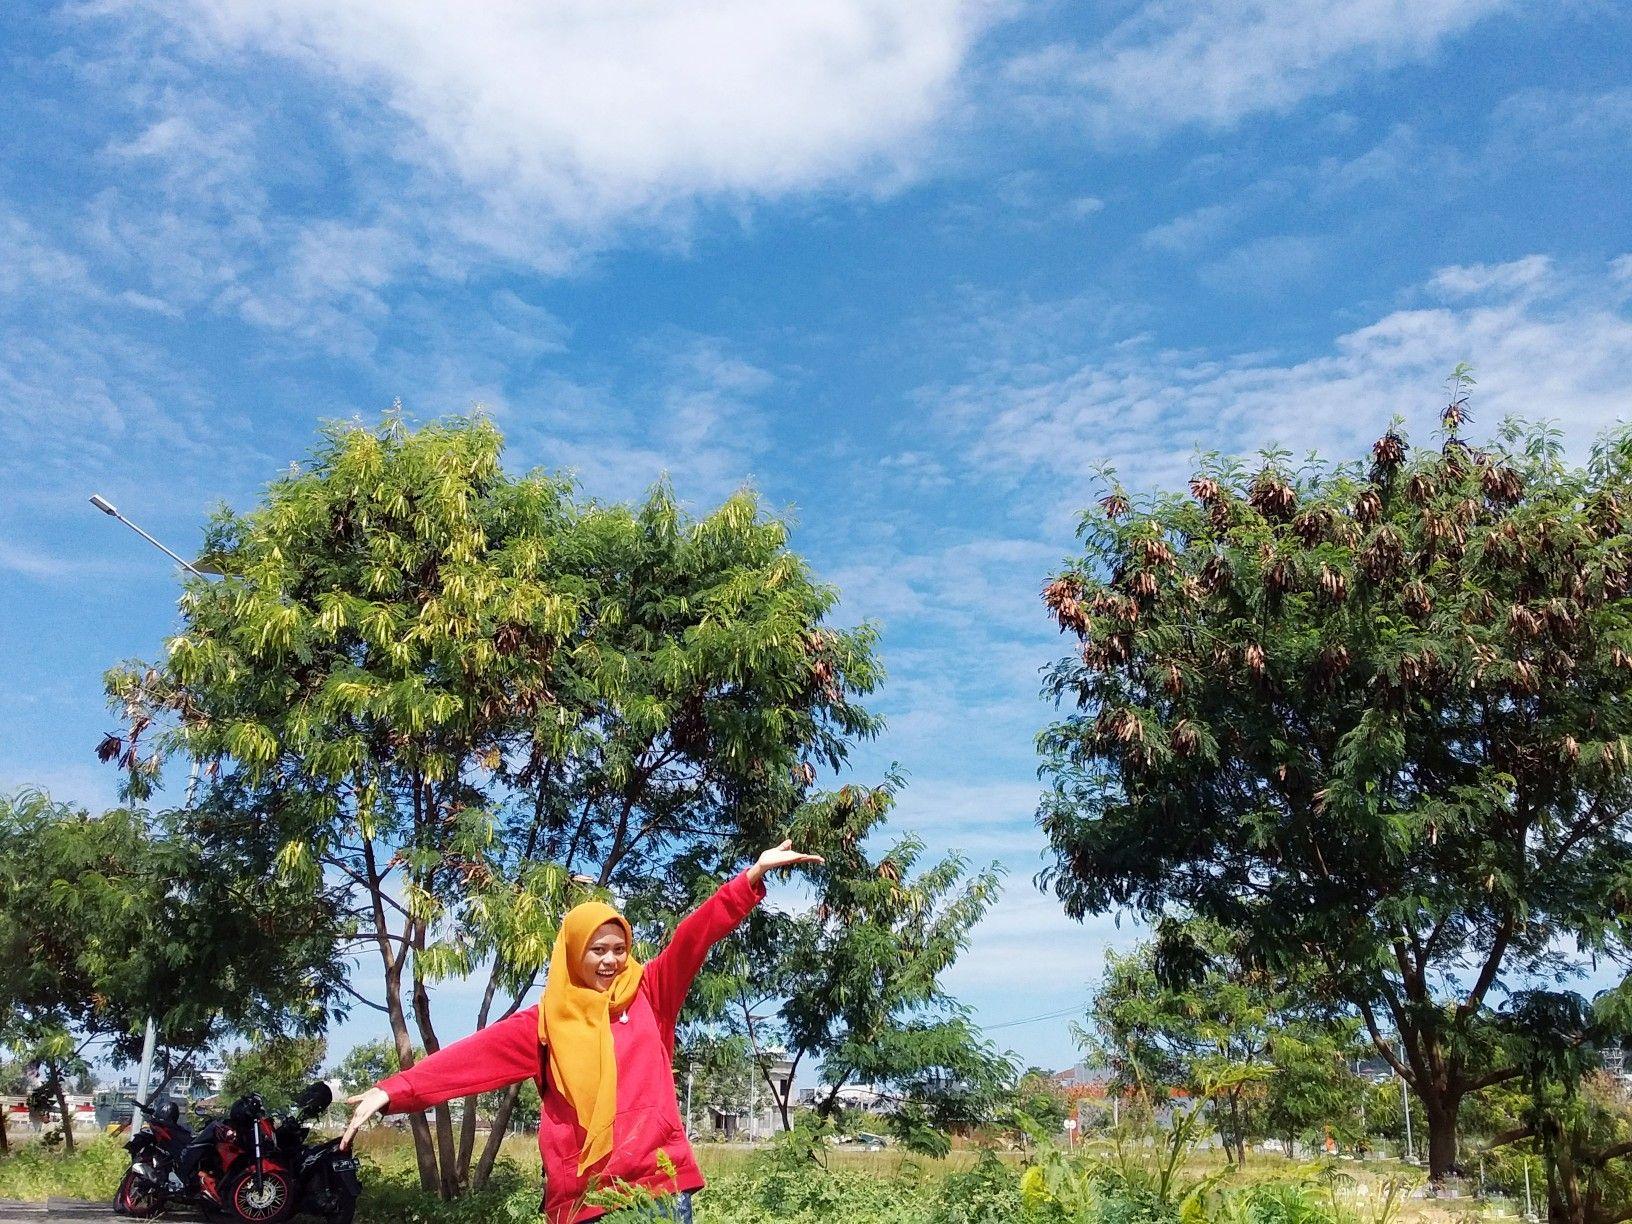 Happy Noviyana Shiali Girl Under The Blue Sky Green Nature.